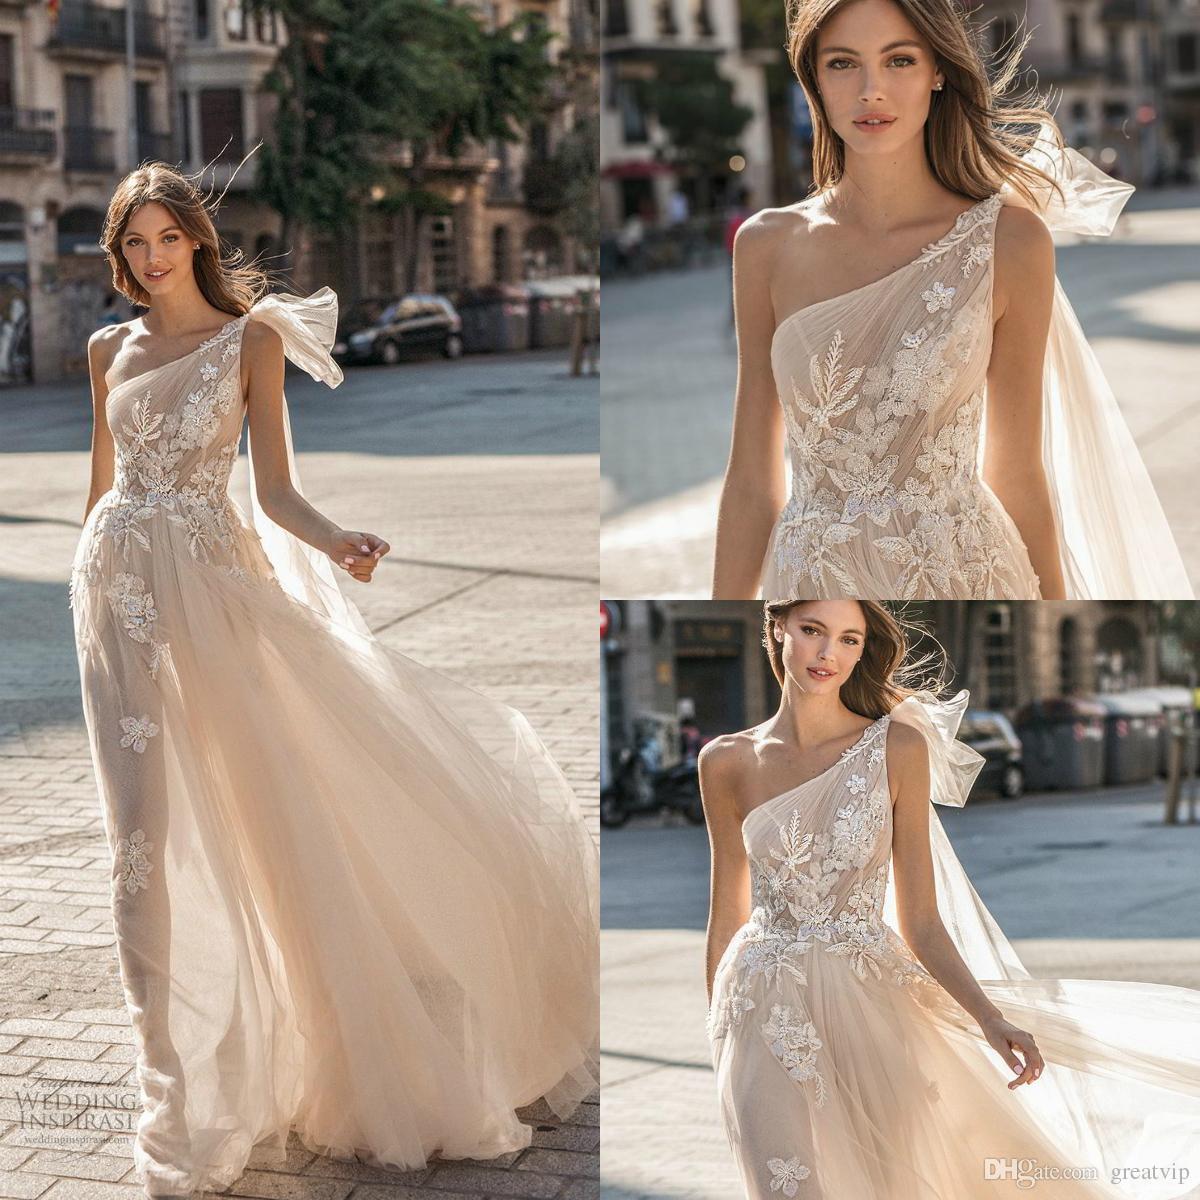 d2c2629f61c1 Discount Muse By Berta 2019 A Line Wedding Dresses One Shoulder Applique  Backless Tulle Sweep Train Bridal Gowns Plus Size Robe De Mariée Cheap  Wedding ...